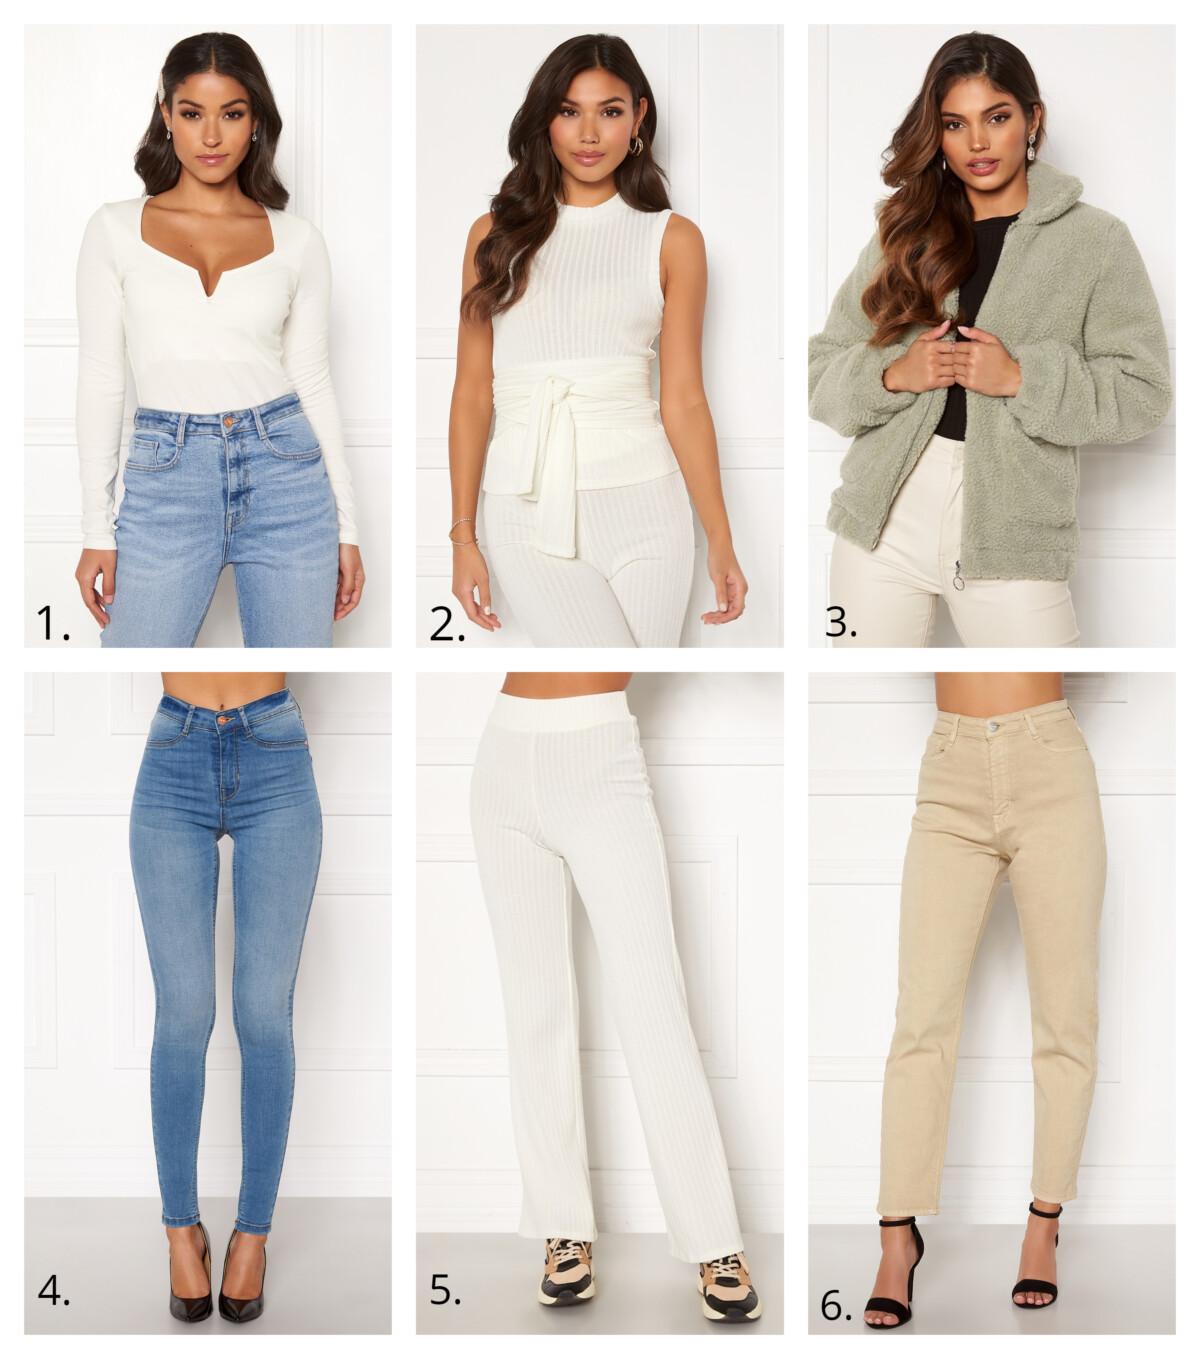 bubbleroom-bubbleroomstyle-isalicious-isalicious1-mote-trend-stil-fashion-style-outfit-antrekk-klær-newin-innkjøp-wants-bikini-kjoler-jeans-isalicious.blogg-no-toppblogger-trender-topplista-blogger-rabattkode